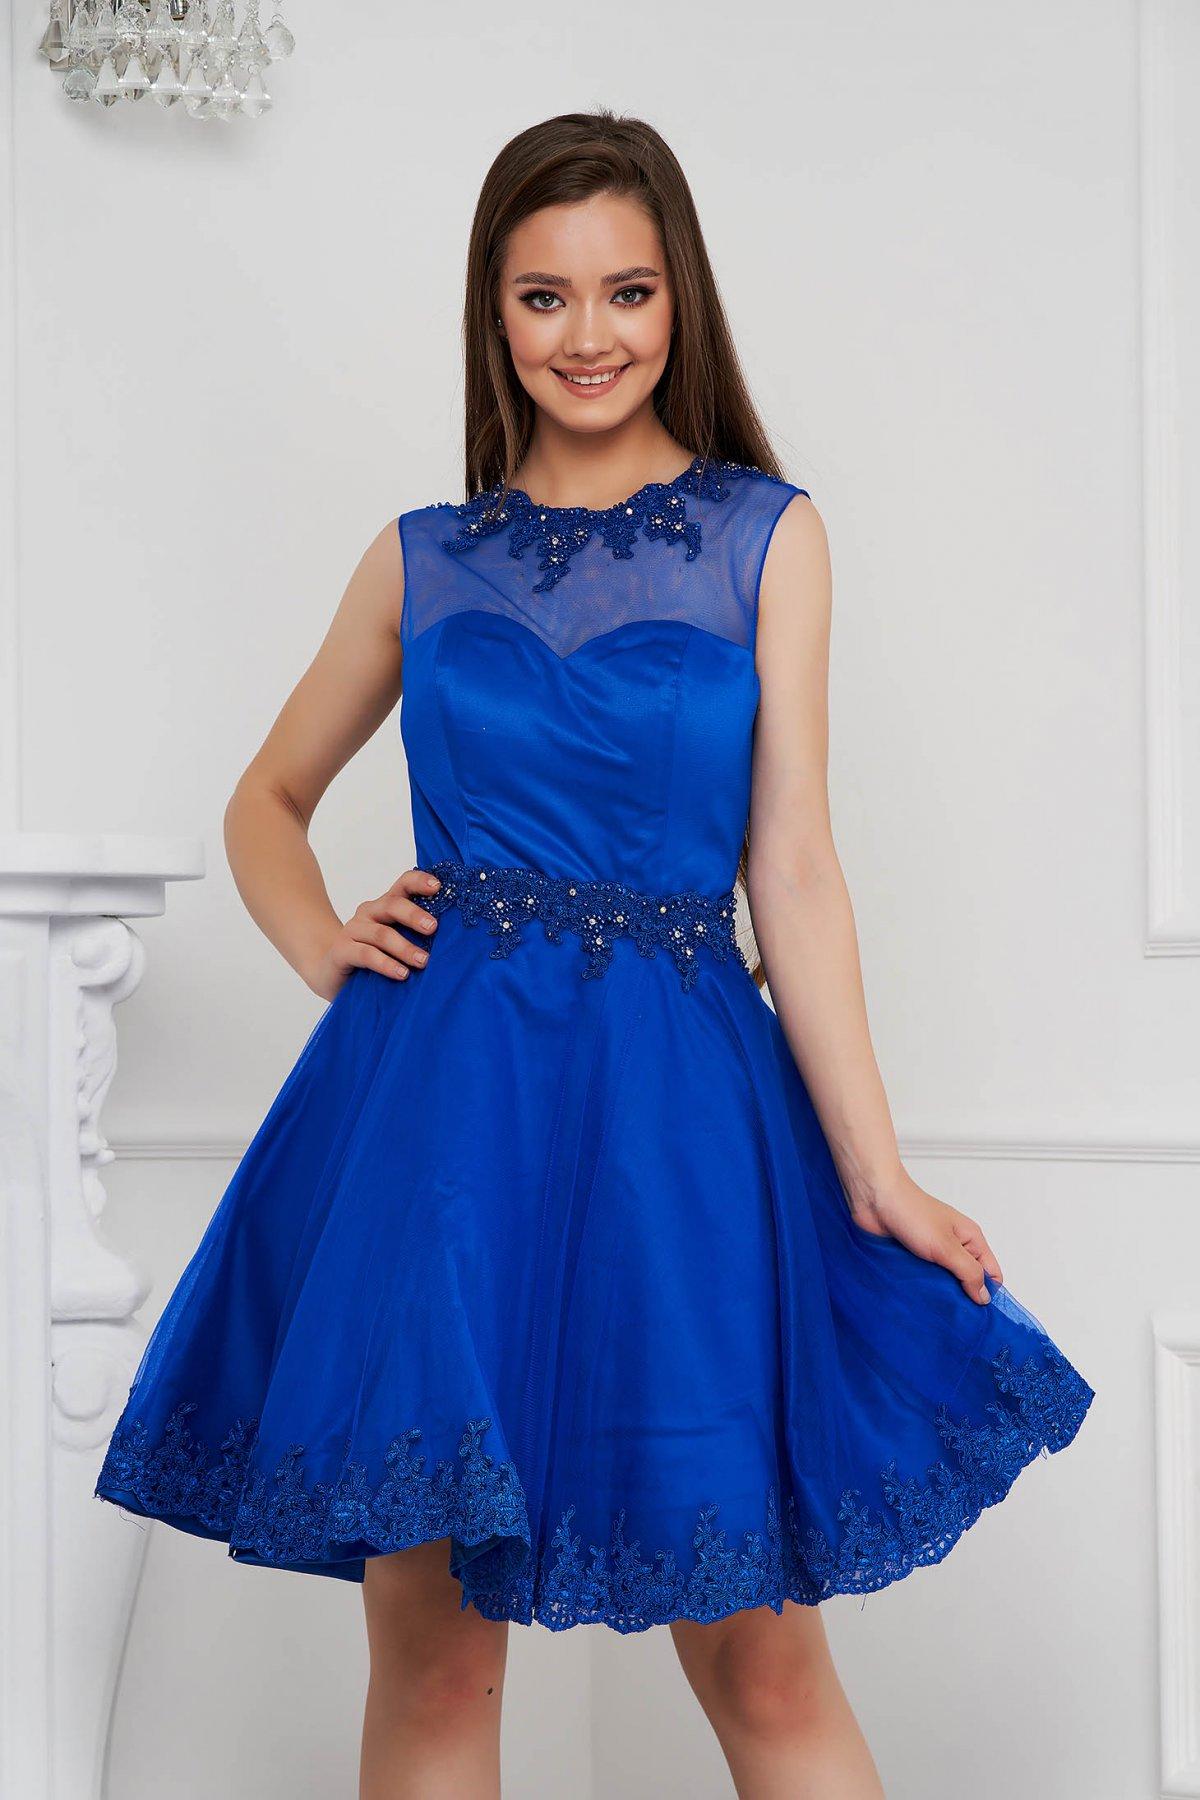 Rochie Lady Pandora albastra scurta in clos din tul cu aplicatii cu perle si pietre stras - medelin.ro